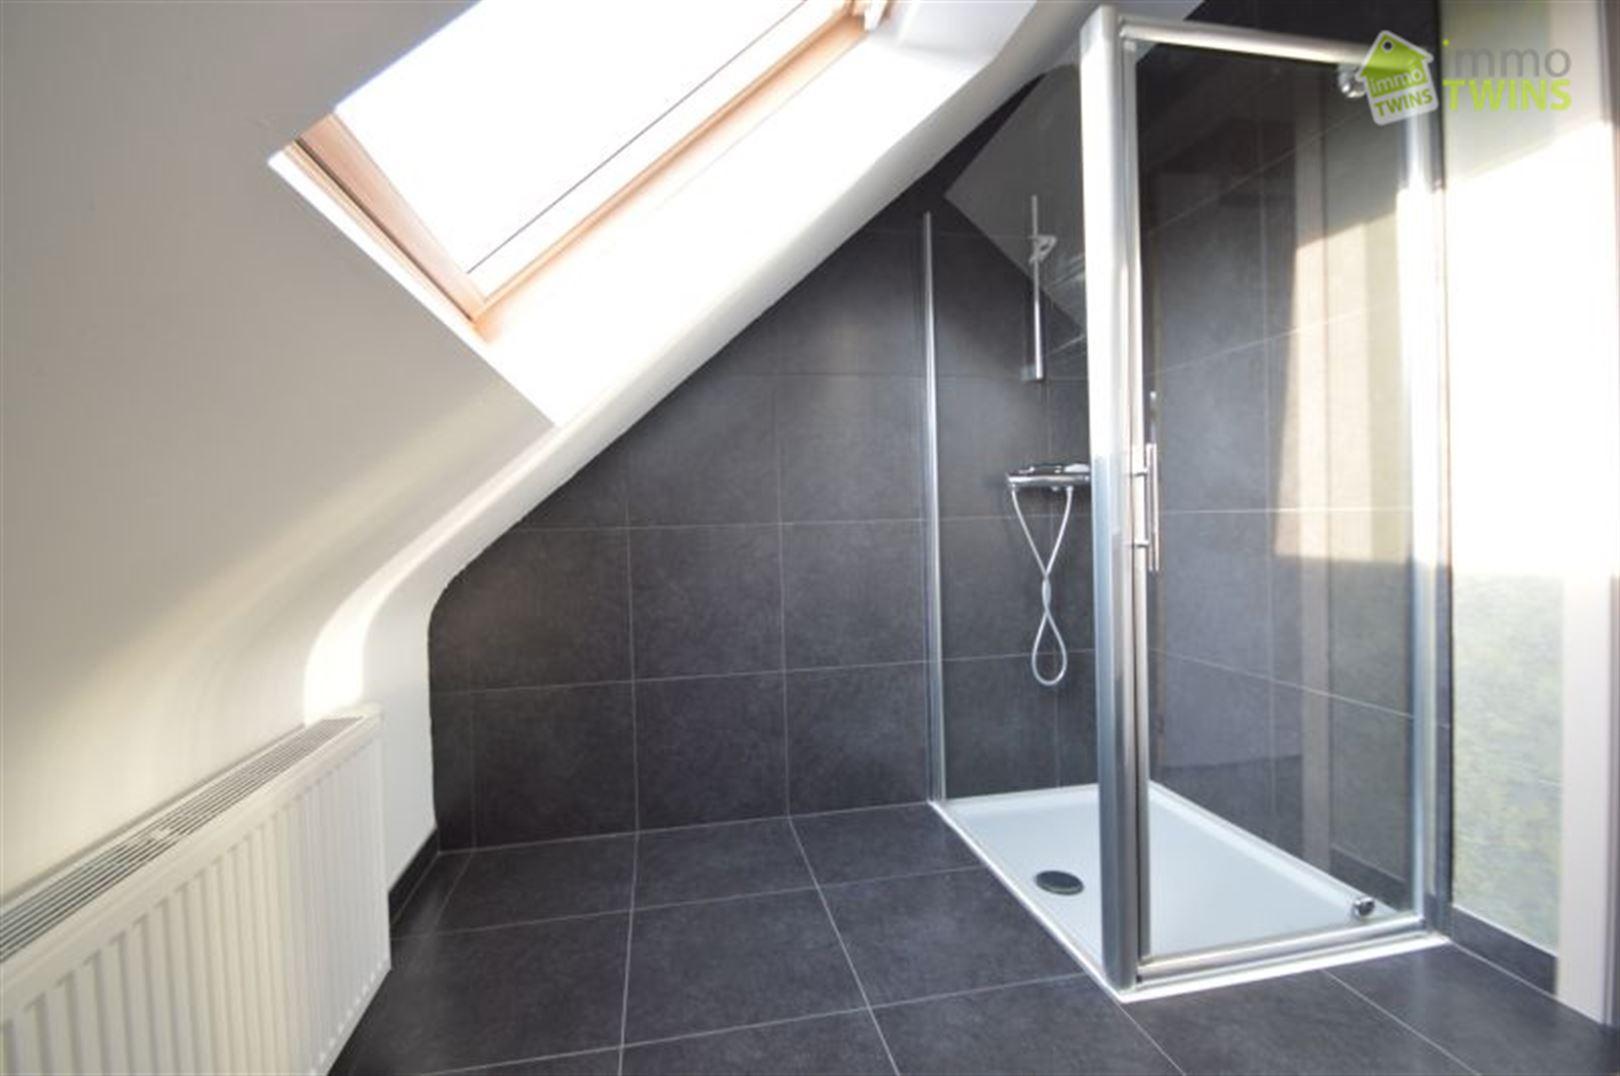 Foto 10 : Appartement te 9200 Baasrode (België) - Prijs € 660